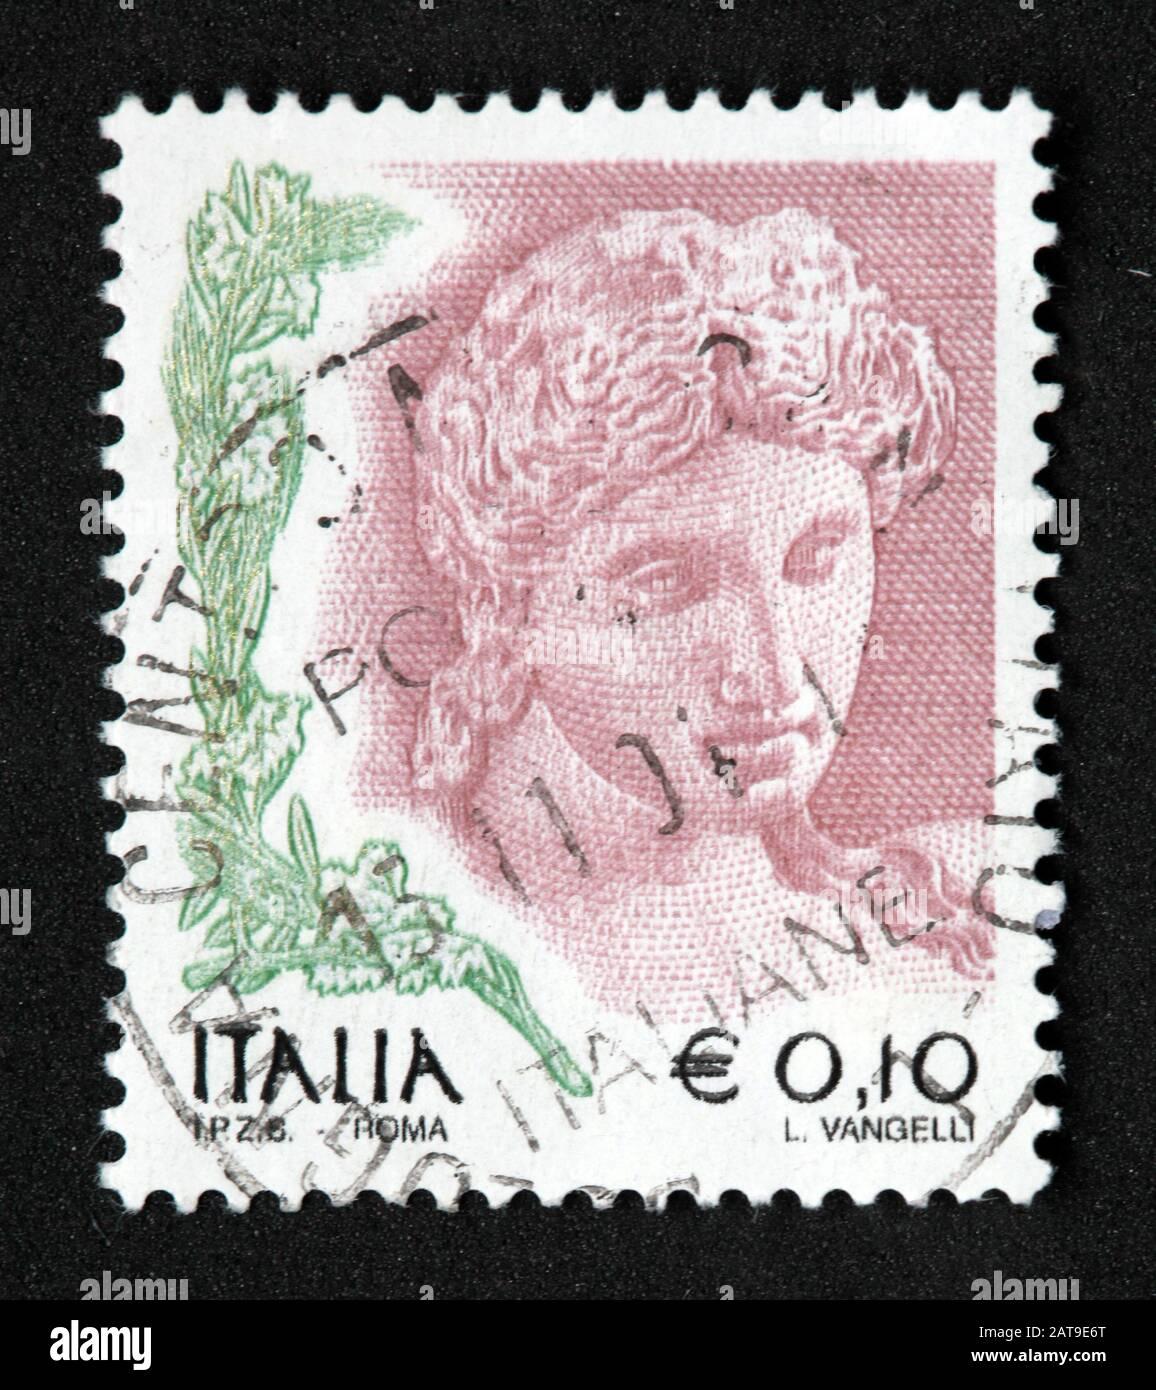 Hotpixuk,@Hotpixuk,GoTonySmith,stamp,postal,franked,frank,used stamps,used franked,used,franked stamp,from envelope,history,historic,old,Italy,Italian,Italia,Italy Stamp,italian stamp,franked Italian stamp,used Italian stamp,Italy stamp,italia E0.10,L Vangelli,10c,10 Cent,woman,female